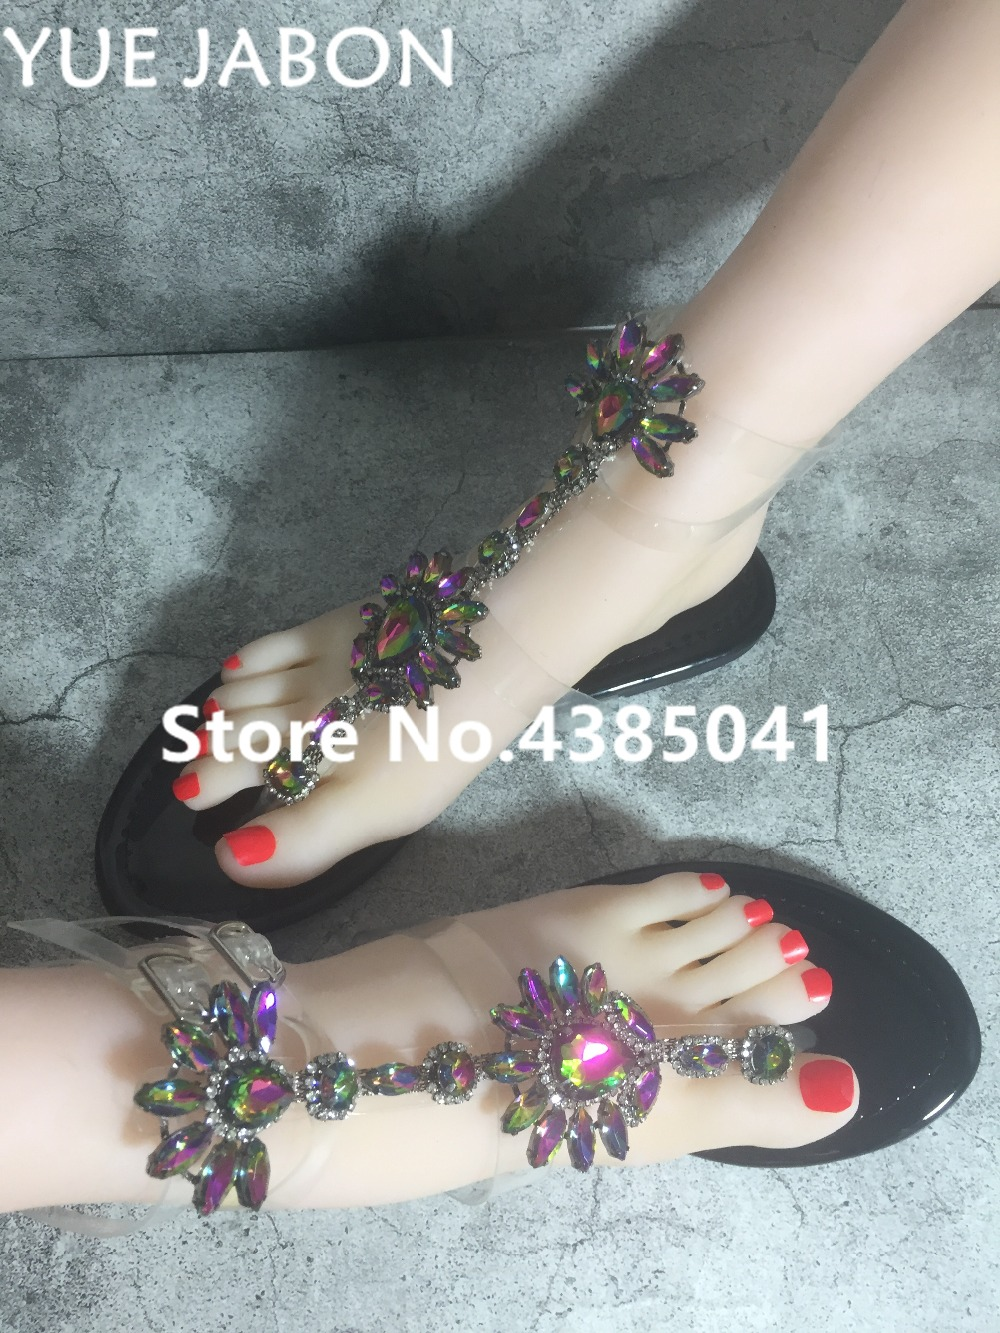 HTB1.q2Or8mWBuNkSndVq6AsApXaI 2019 Woman Sandals Women Shoes Rhinestones Gladiator Flat Sandals Crystal Chaussure Plus Size 43 tenis feminino Green Flip Flops